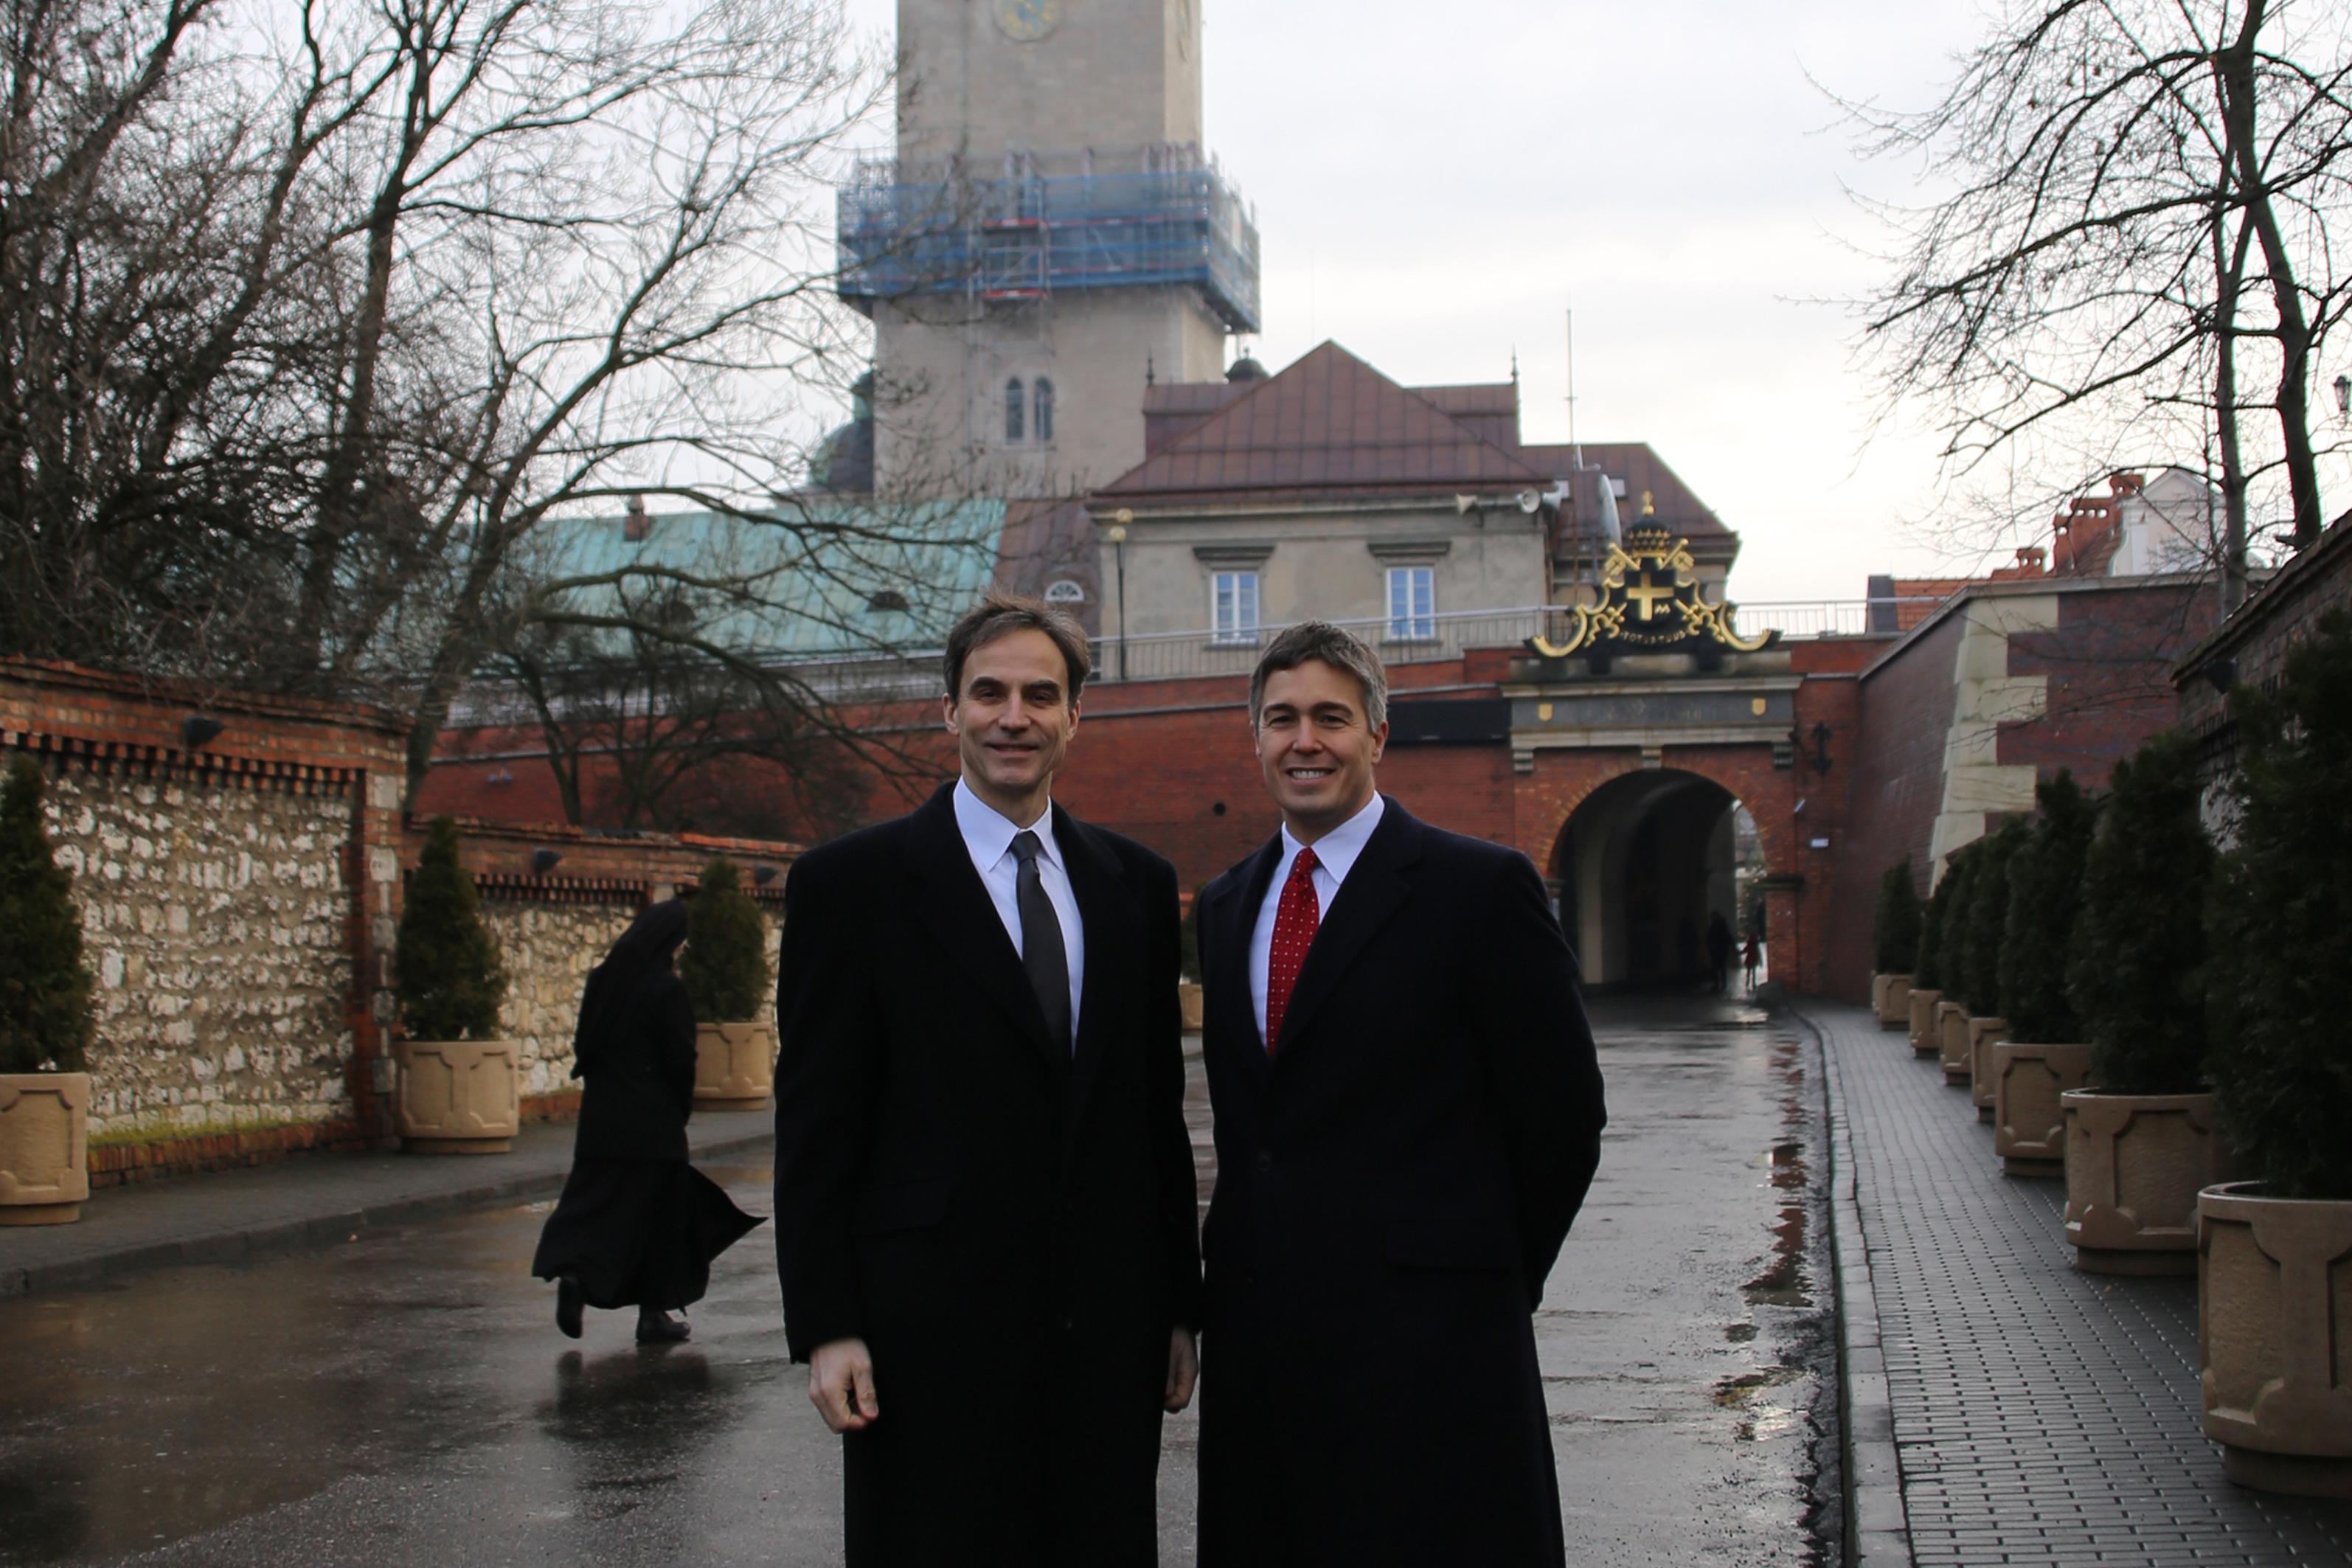 Ambasador Paul Jones i konsul generalny Walter Braunohler na Jasnej Górze.